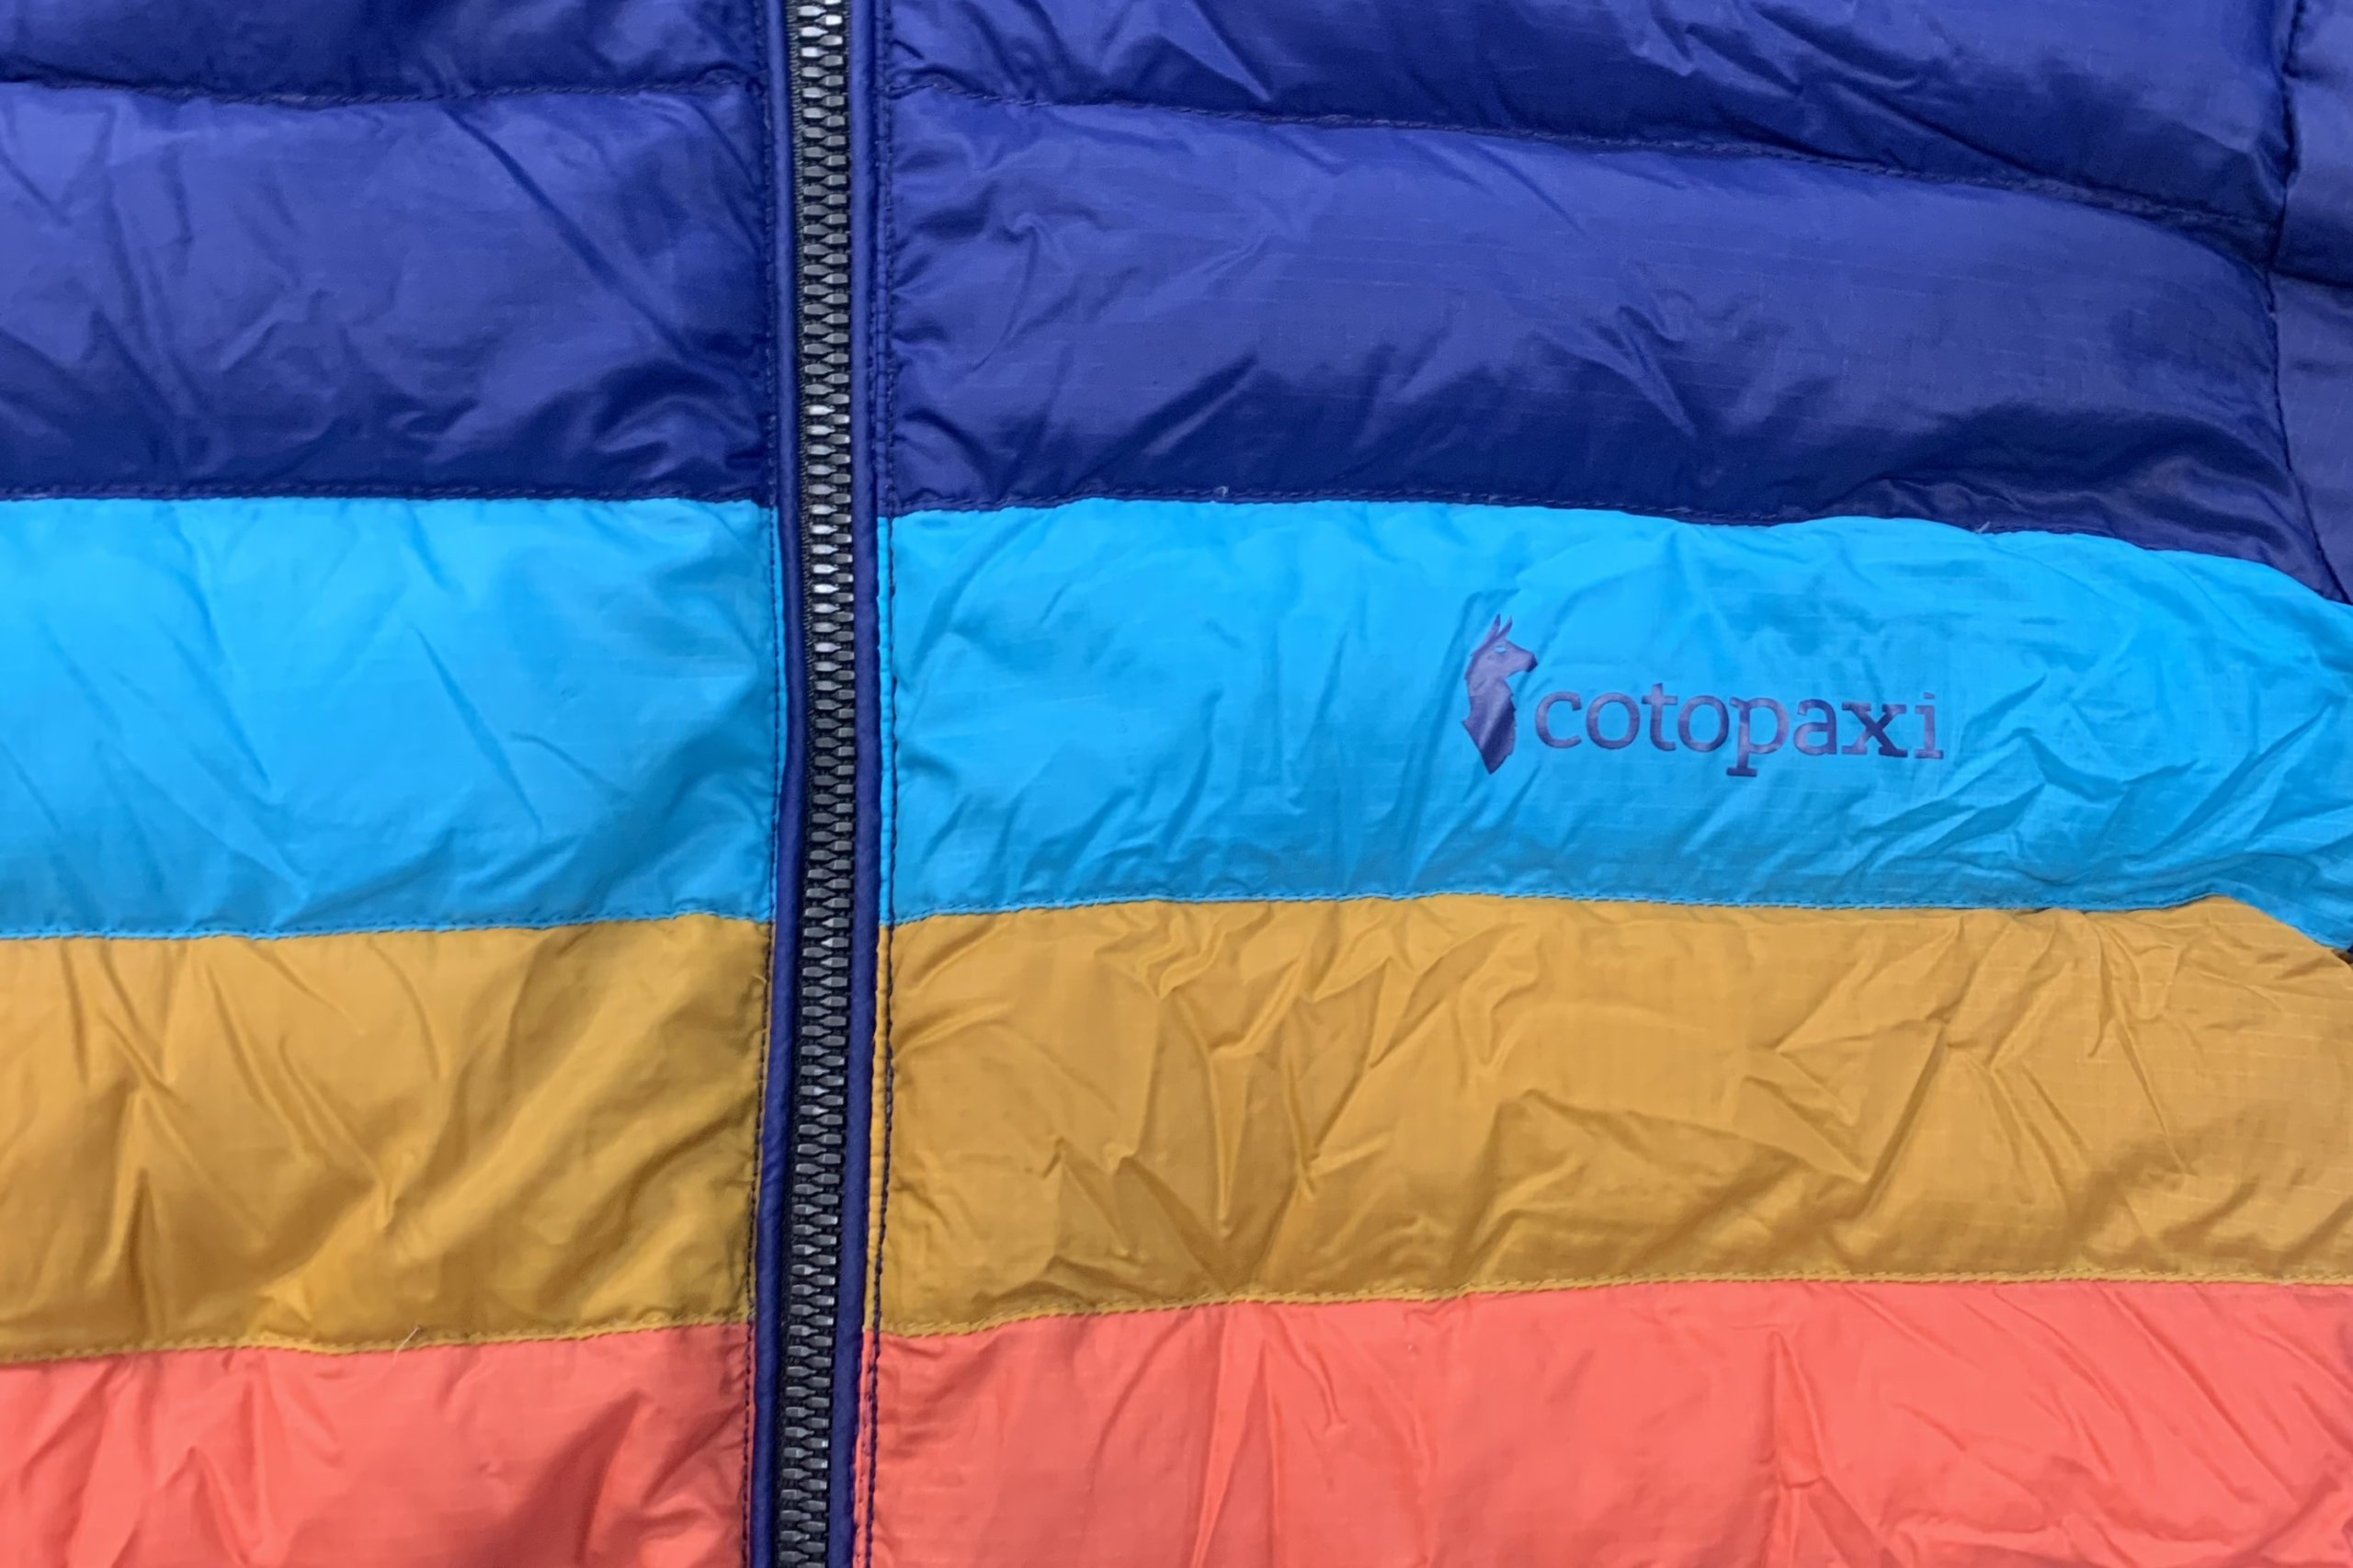 Cotopaxi down jacket zipper replacement